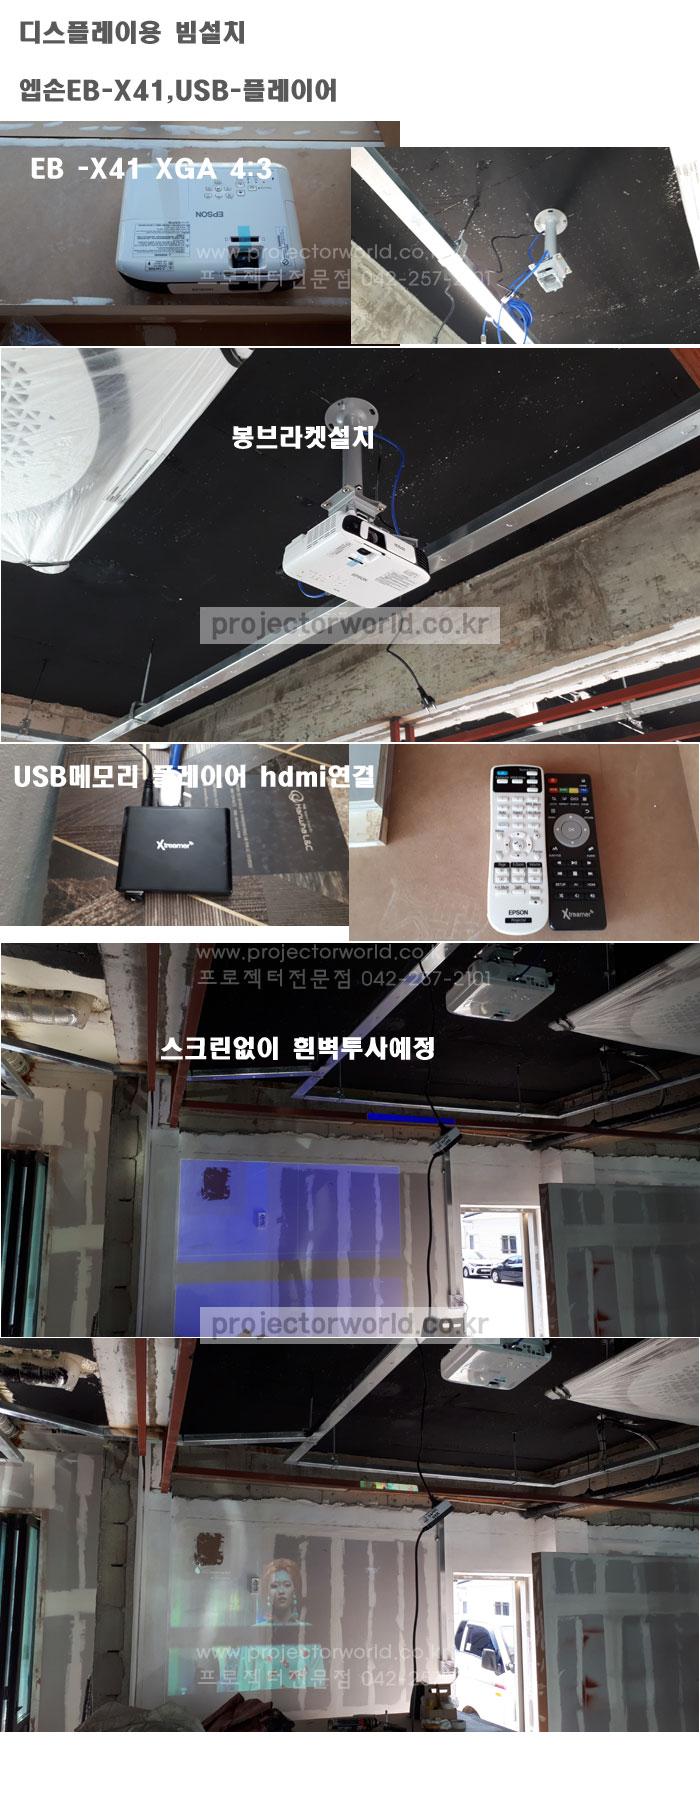 EB-X41,디빅스동영상,usb플레이어,